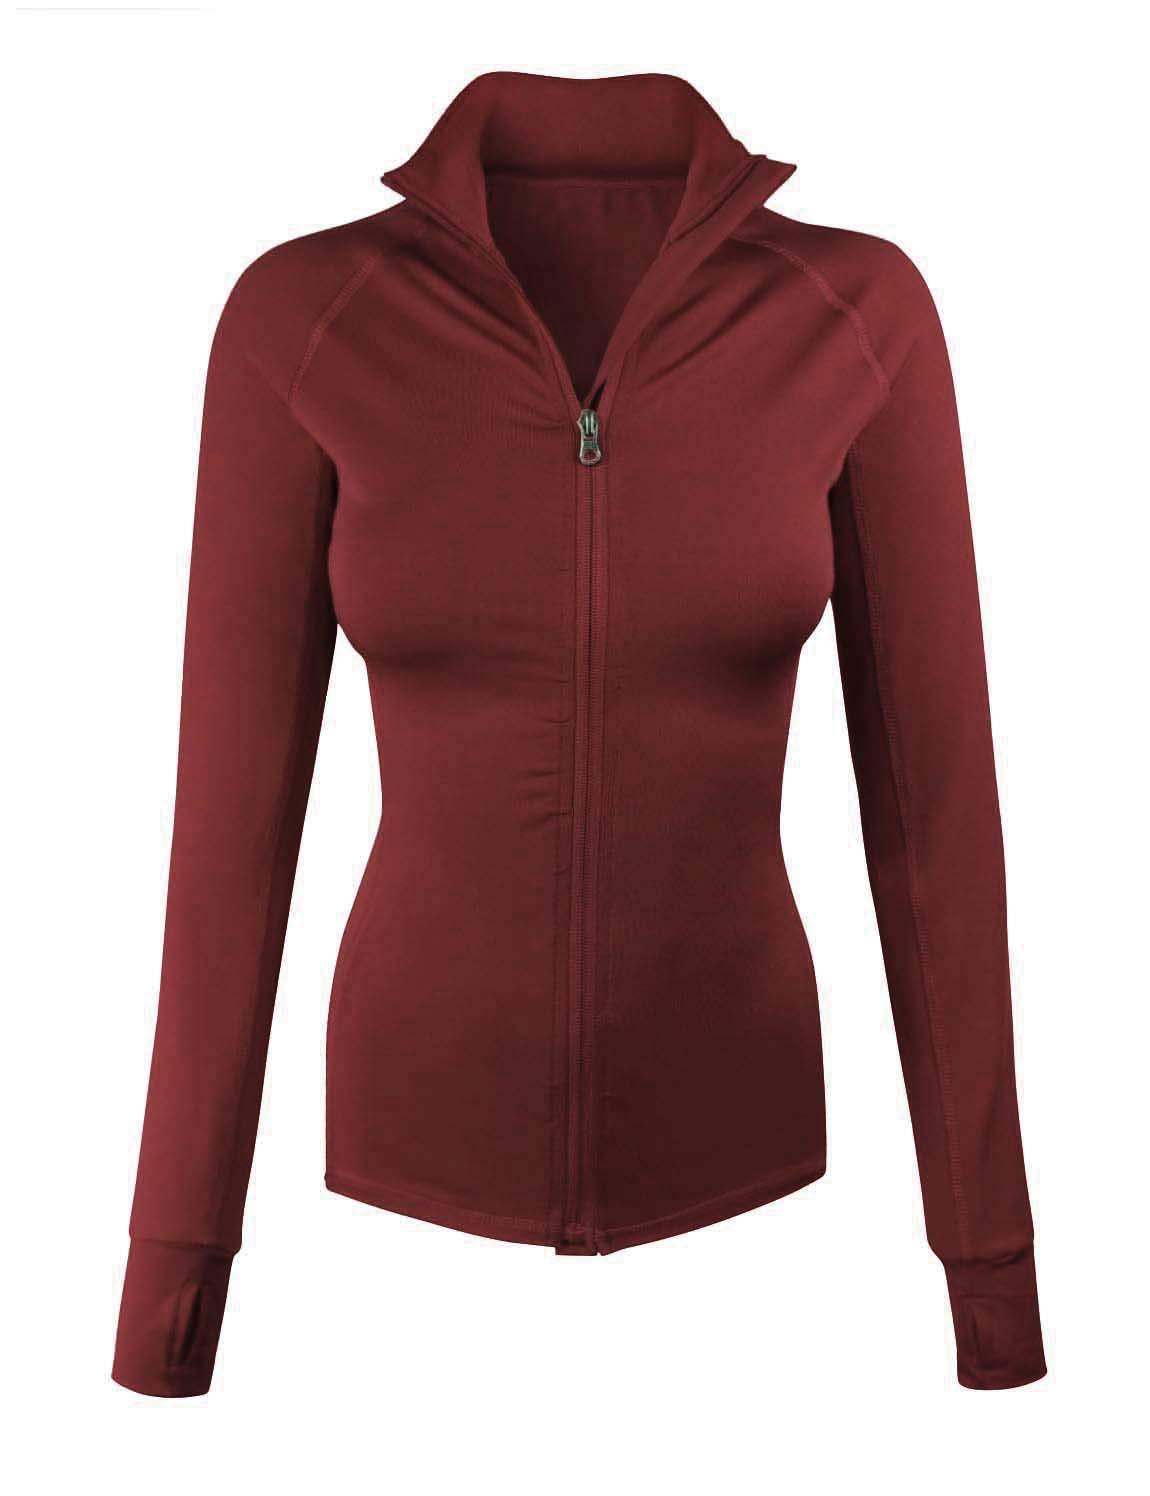 makeitmint Women's Comfy Zip Up Stretchy Work Out Track Jacket w/Back Pocket Small YJZ0002_02CRIMSON